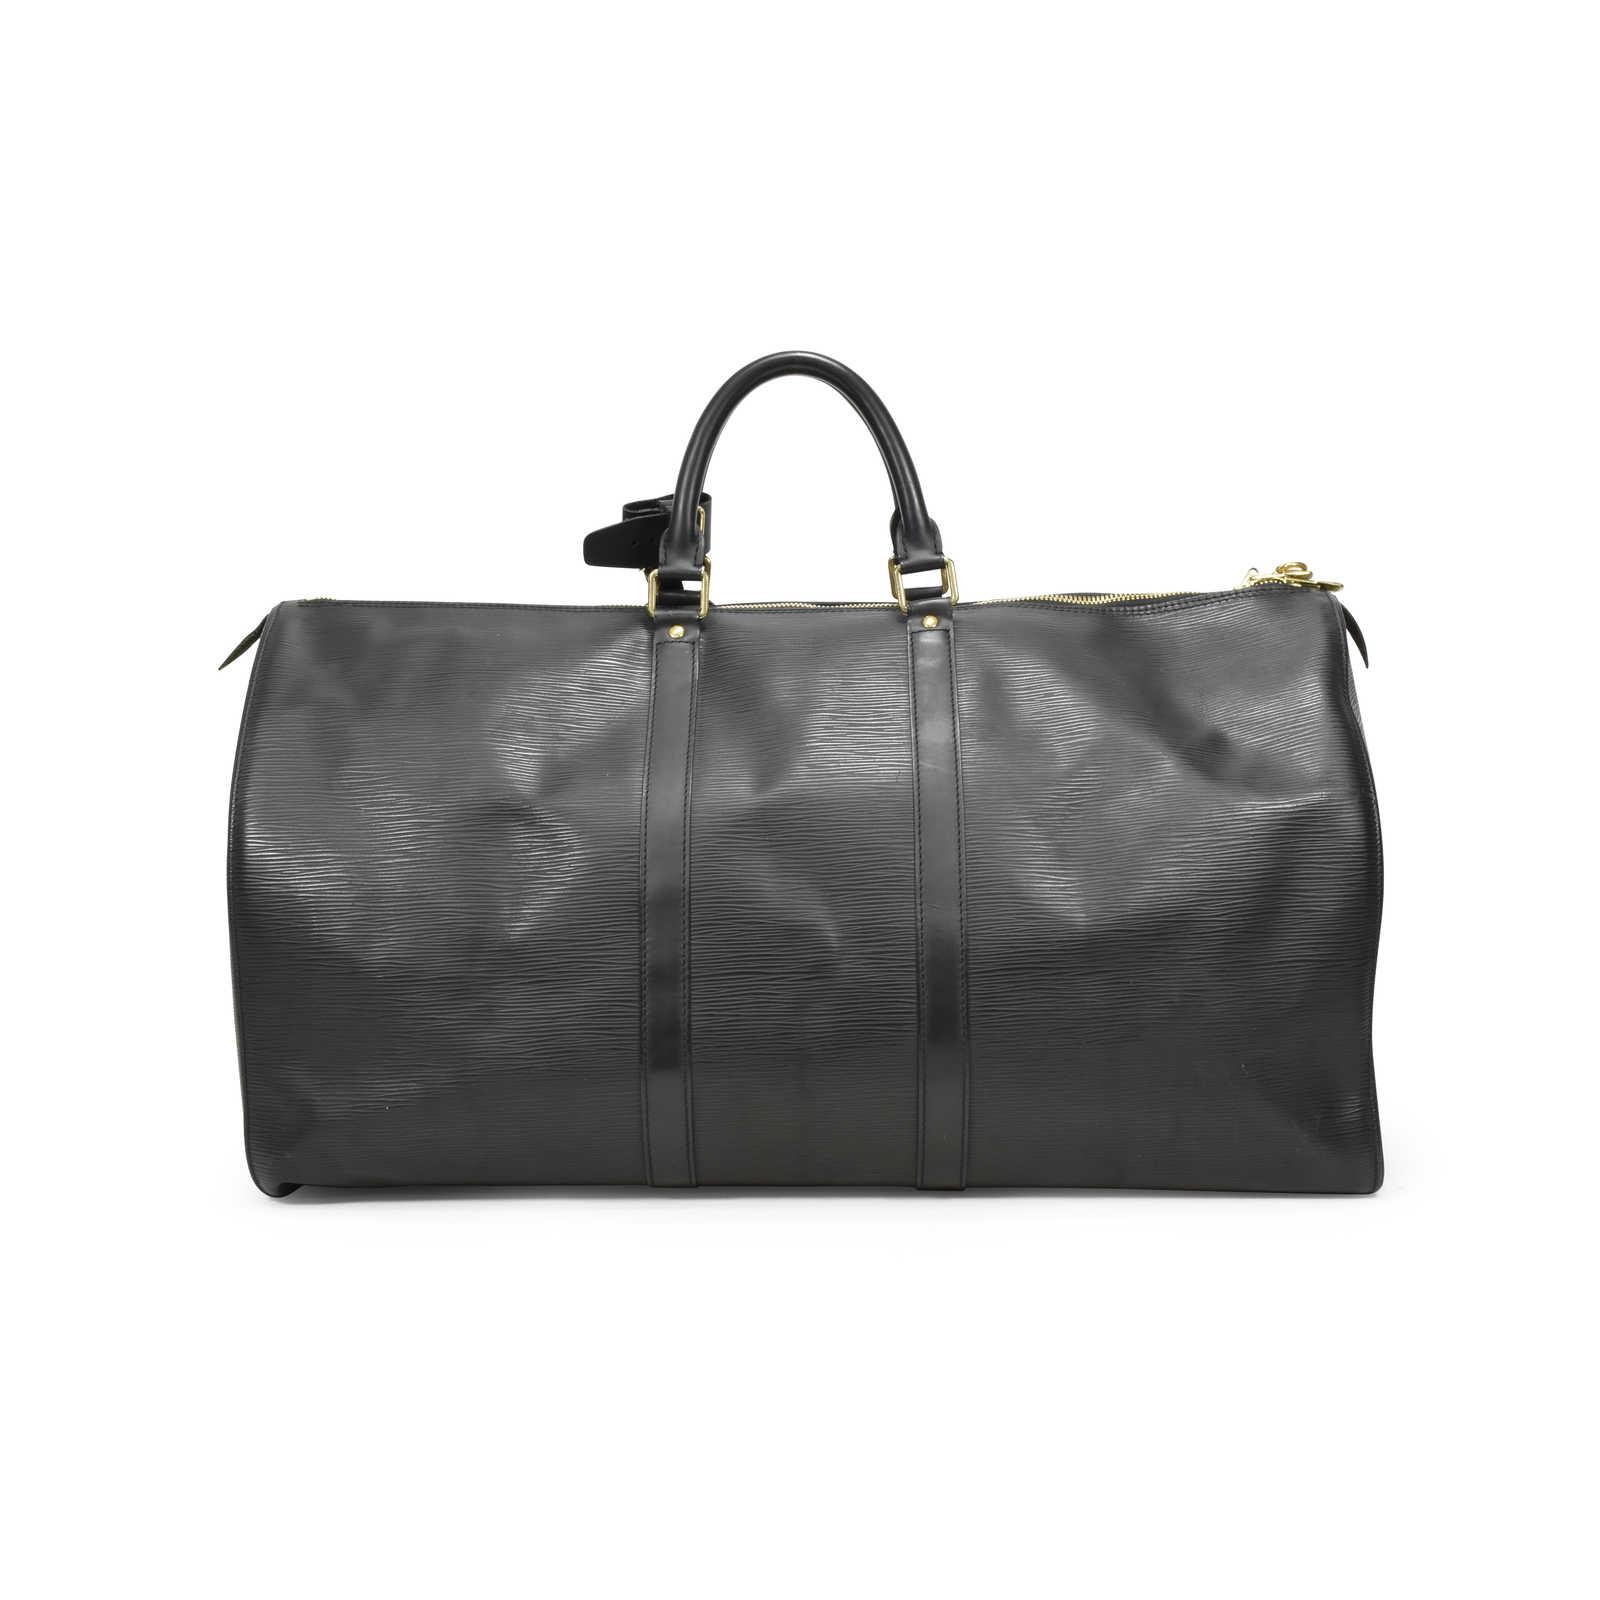 78fdfec7256 Authentic Second Hand Louis Vuitton Epi KeepAll 55 (PSS-126-00019 ...